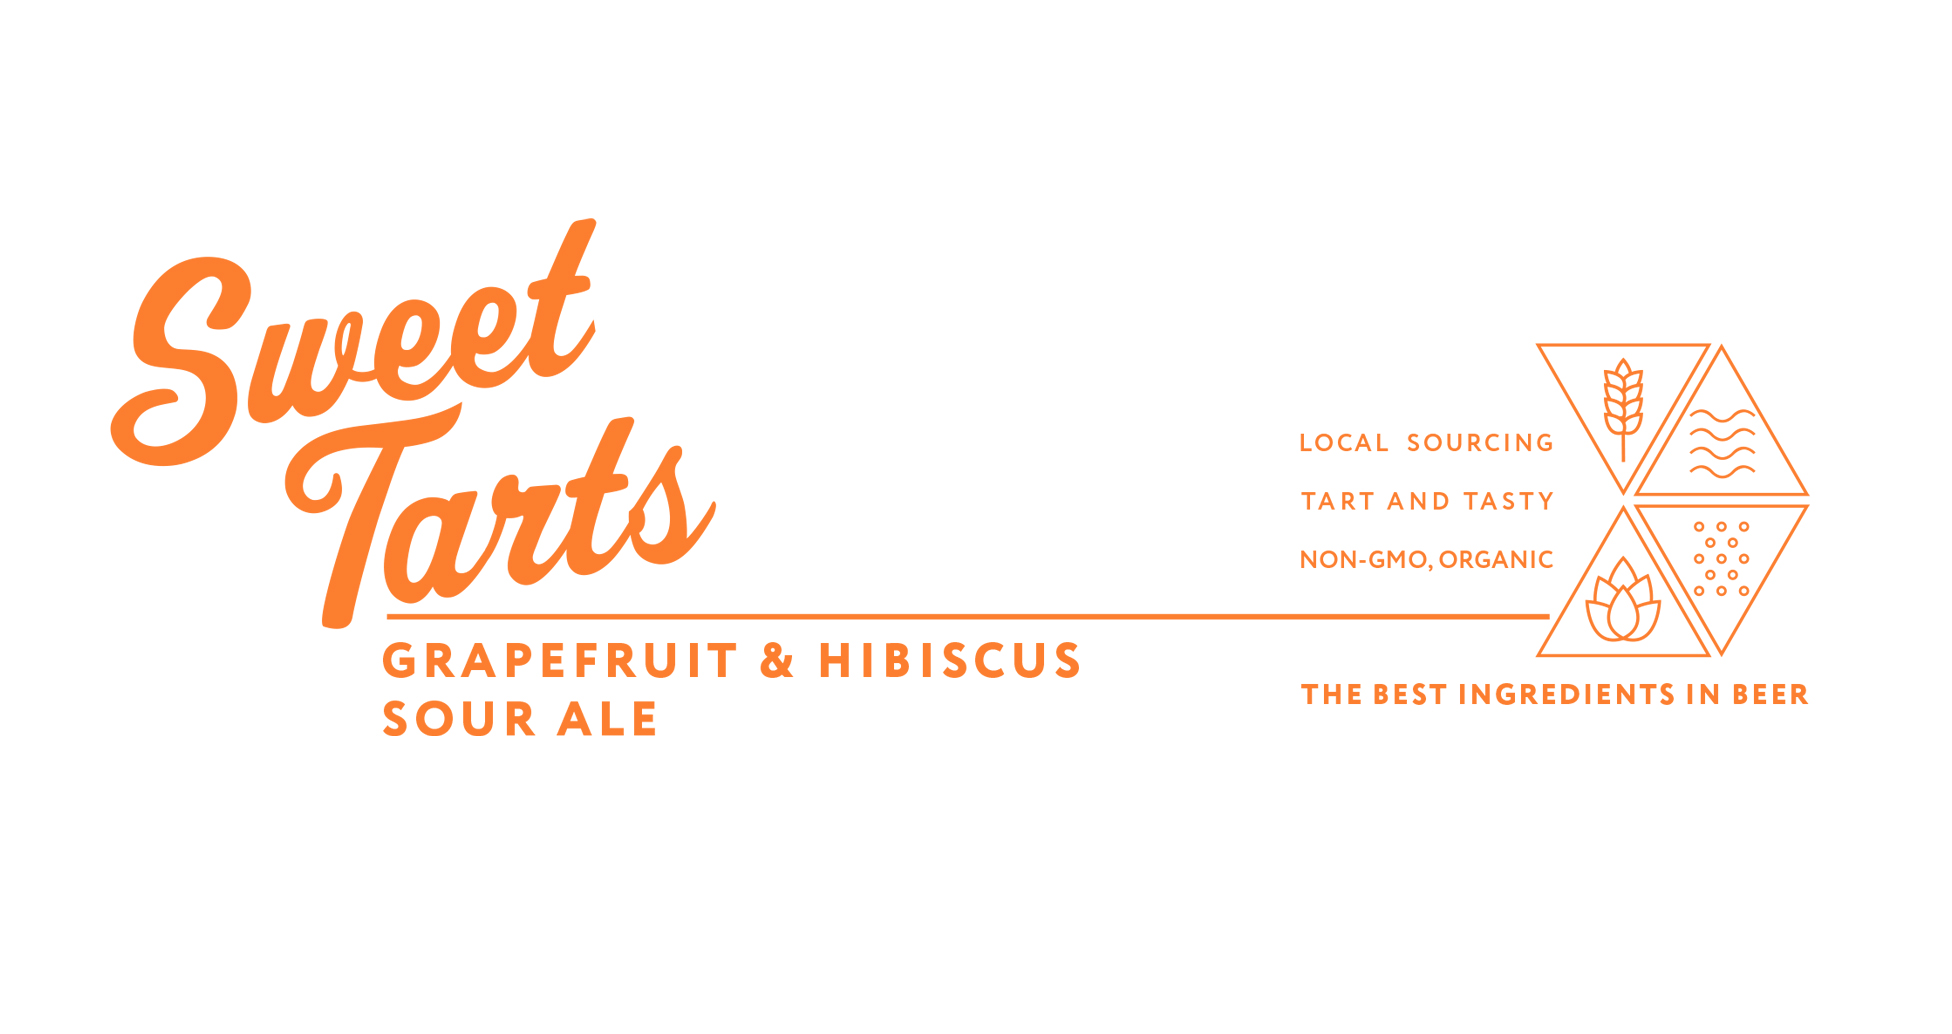 SweetTarts_Grapefruit (1).jpg